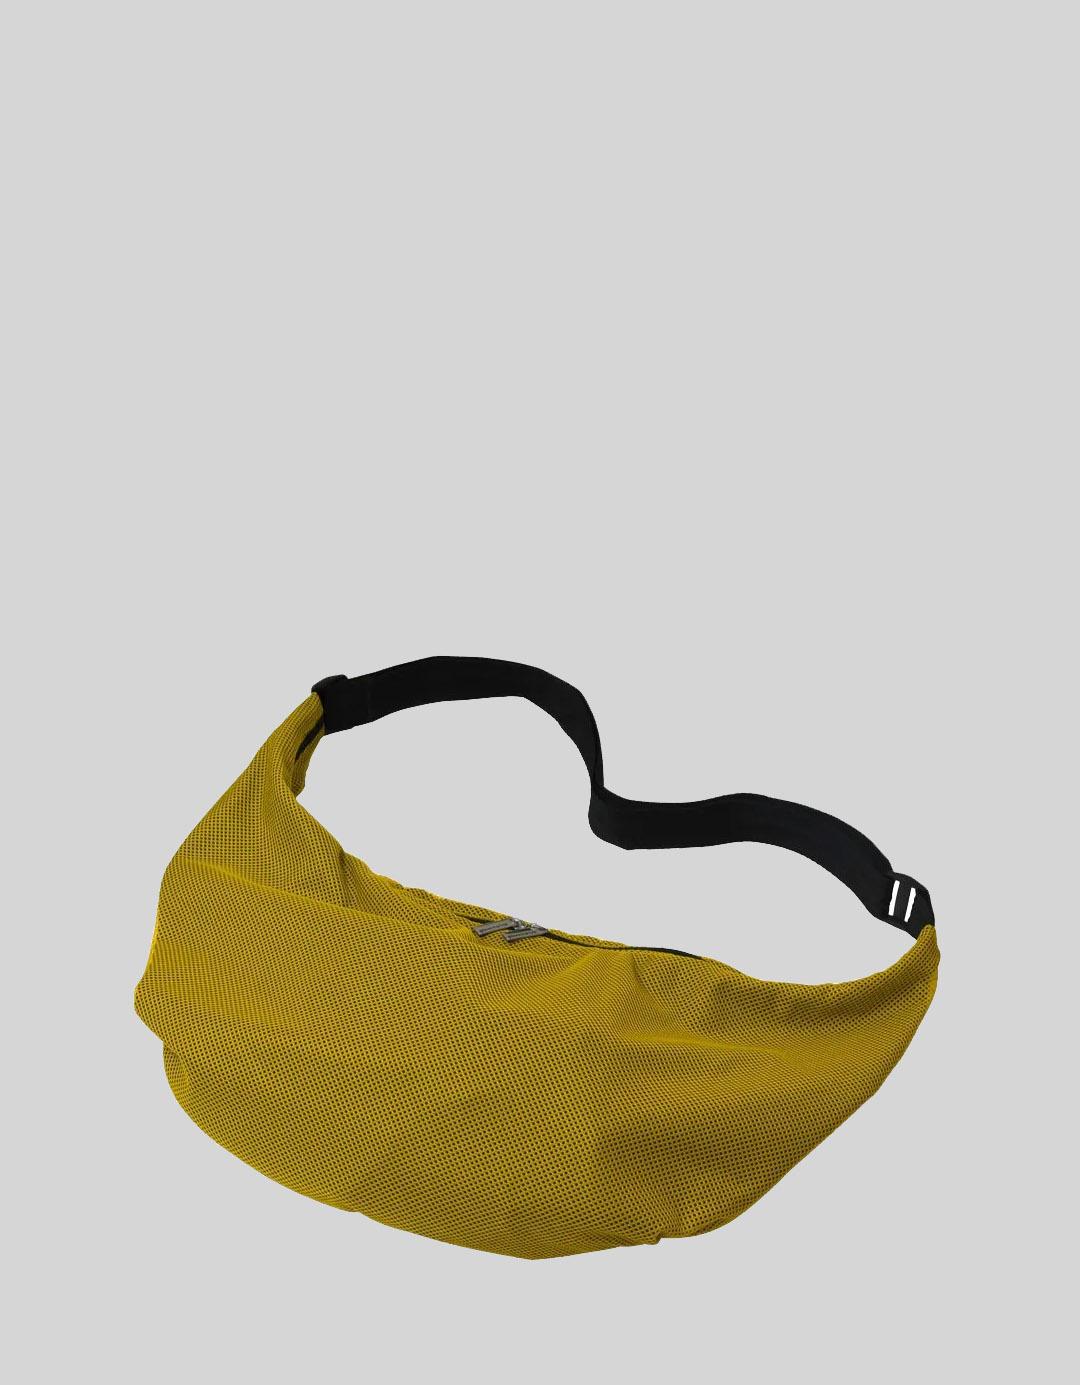 Bolsa Transversal Amarela Fitness Praia Rafting